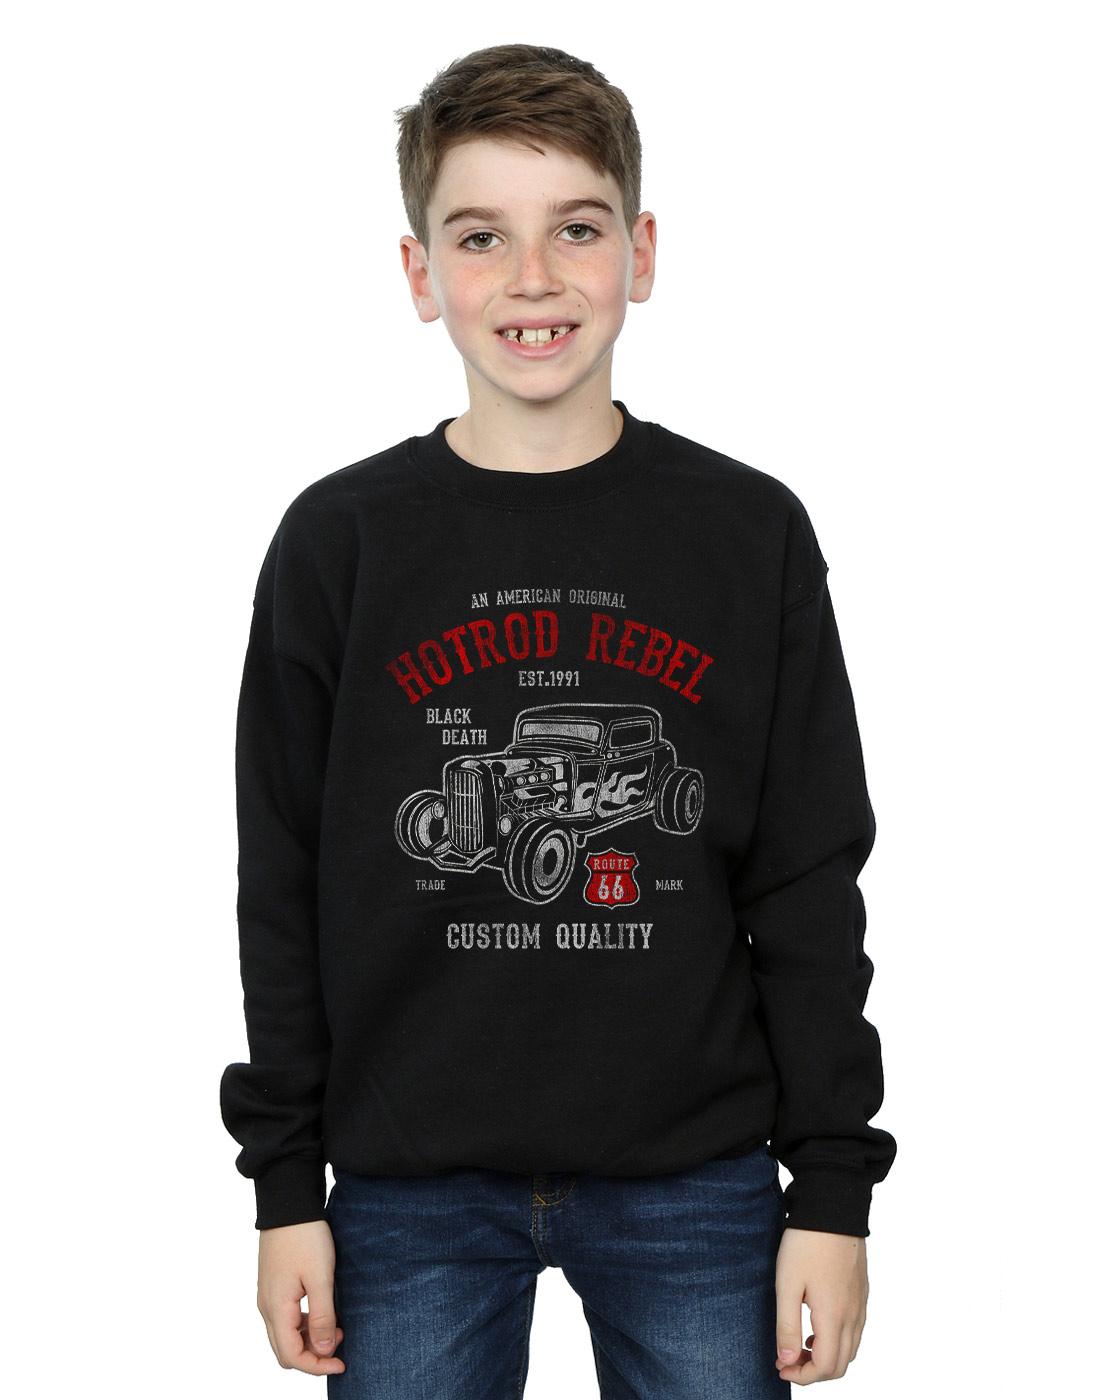 Hotrod Rebel Custom Kids Sweatshirt